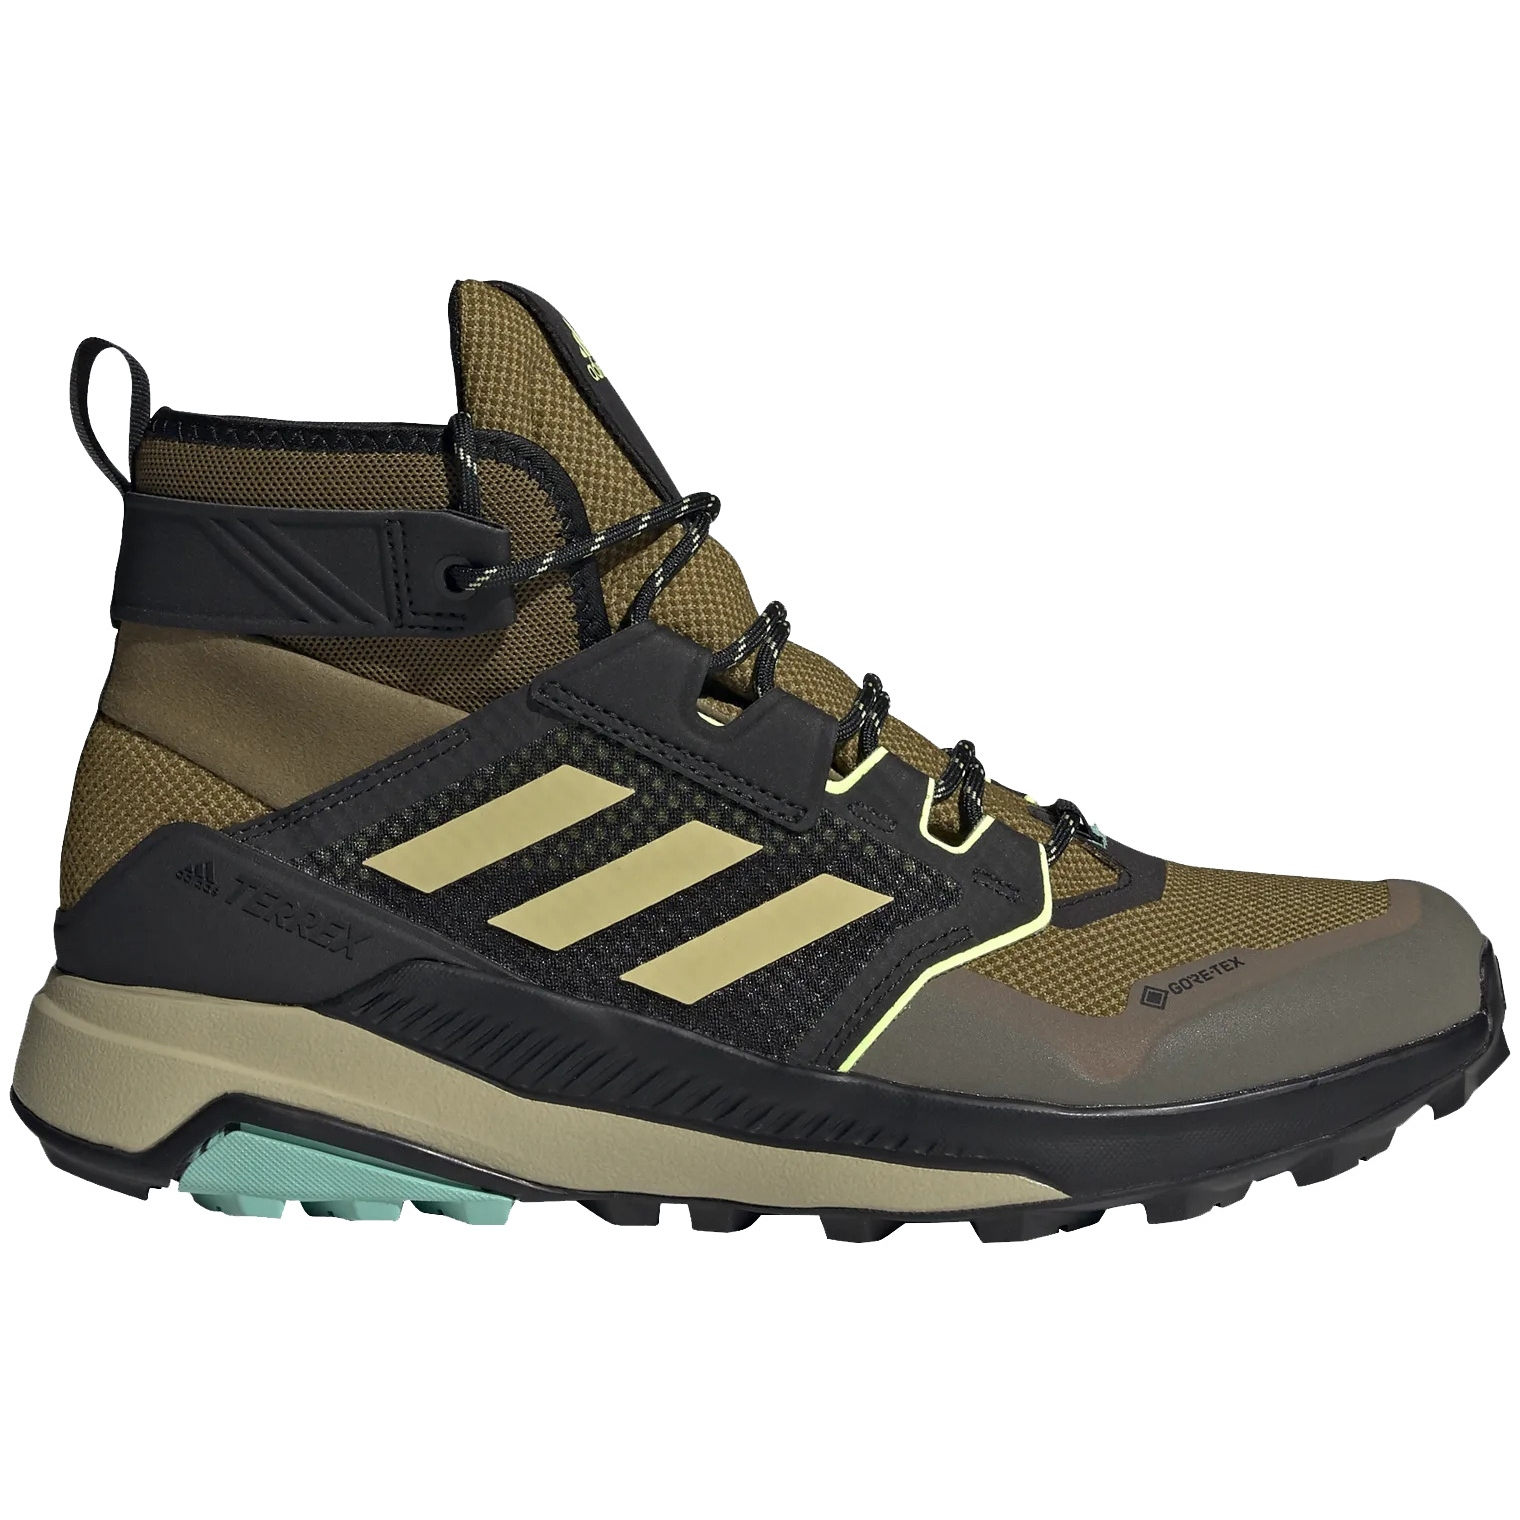 adidas Männer TERREX Trailmaker Mid GORE-TEX Wanderschuhe - wild moss/halo gold/hi-res yellow FZ2511